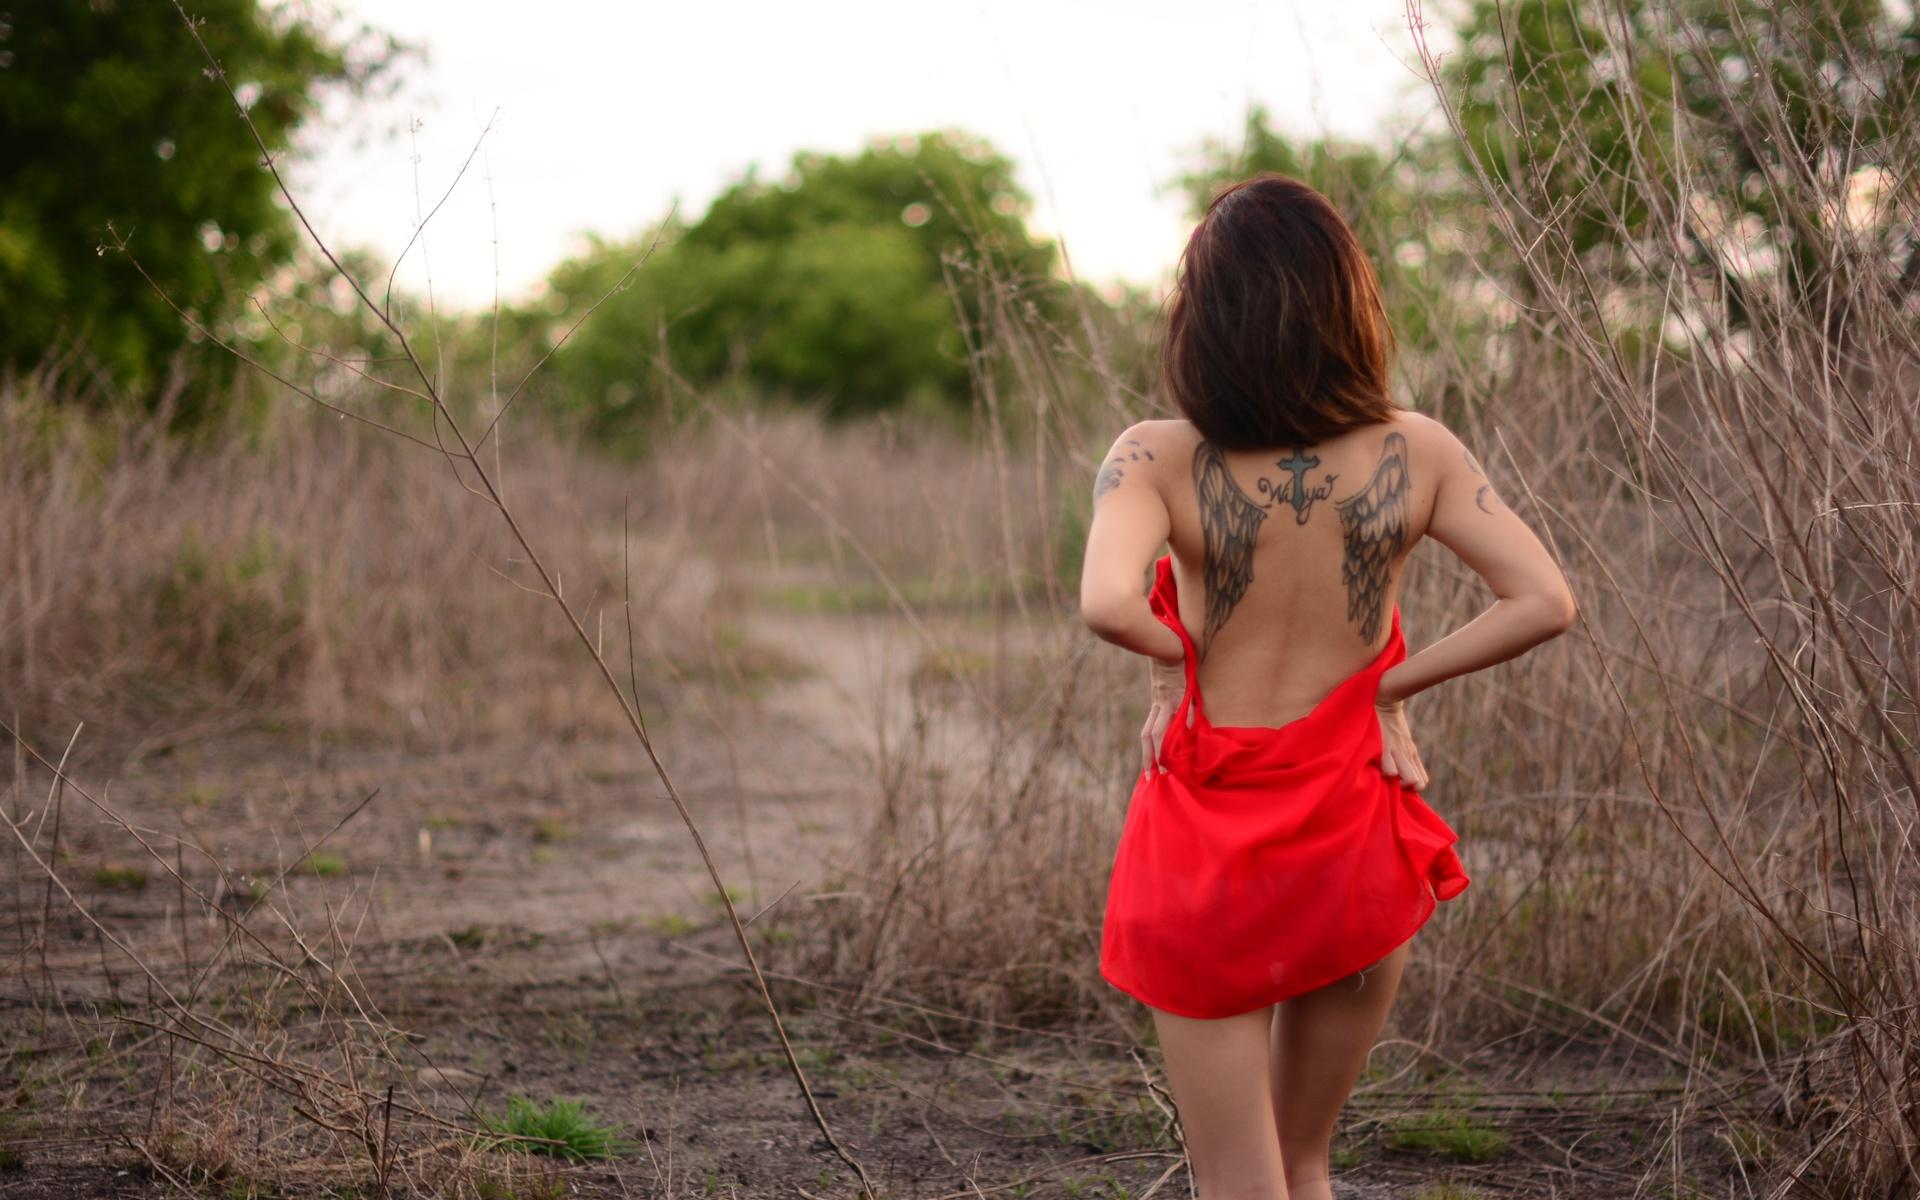 девушка, кусты, спина, тату, красный, сарафан, крылья